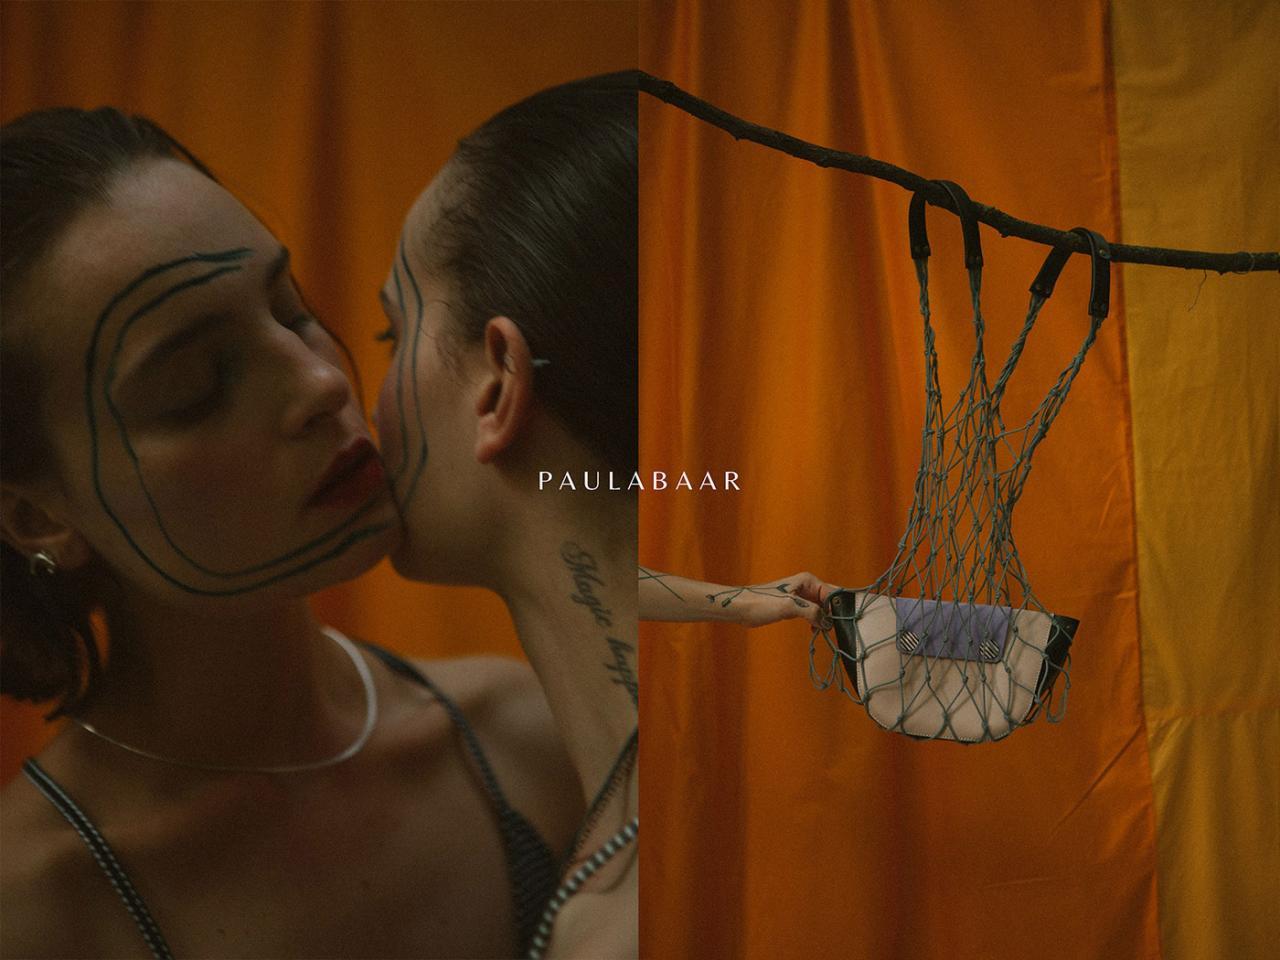 Kamil Kotarba摄影作品PAULABAAR campaign SS 2018/19 时尚图库 第9张